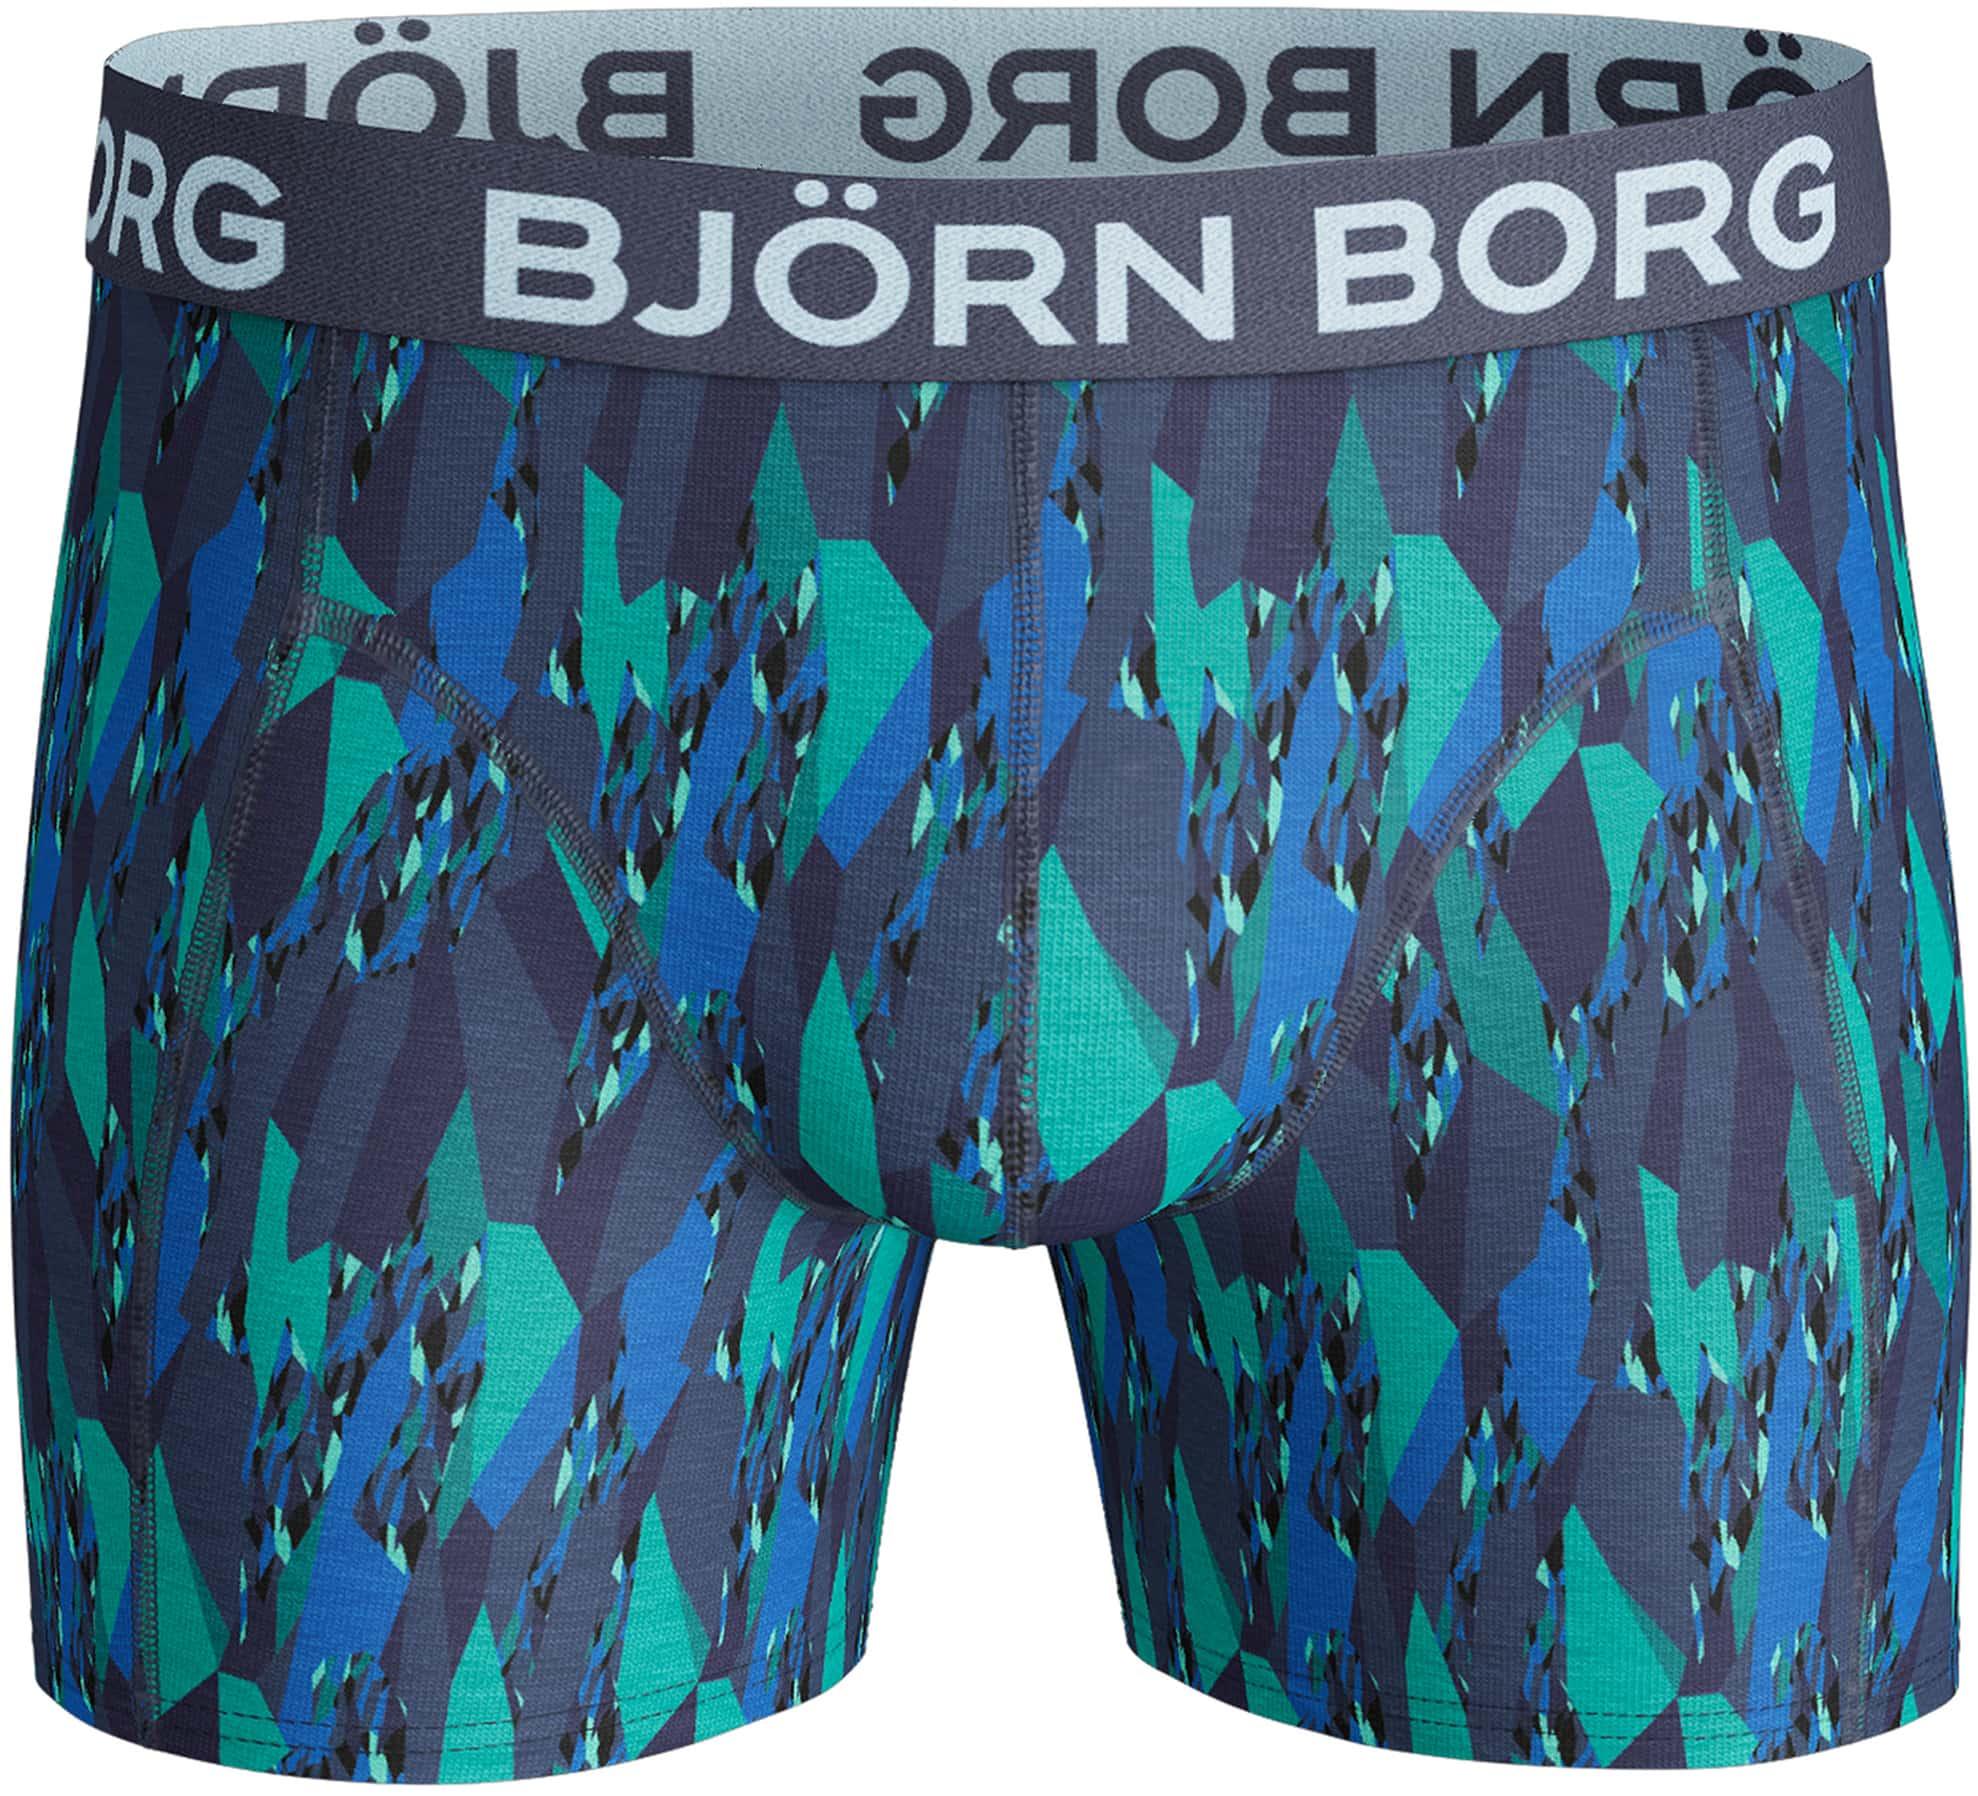 Bjorn Borg Boxers 2-Pack Patroon foto 1